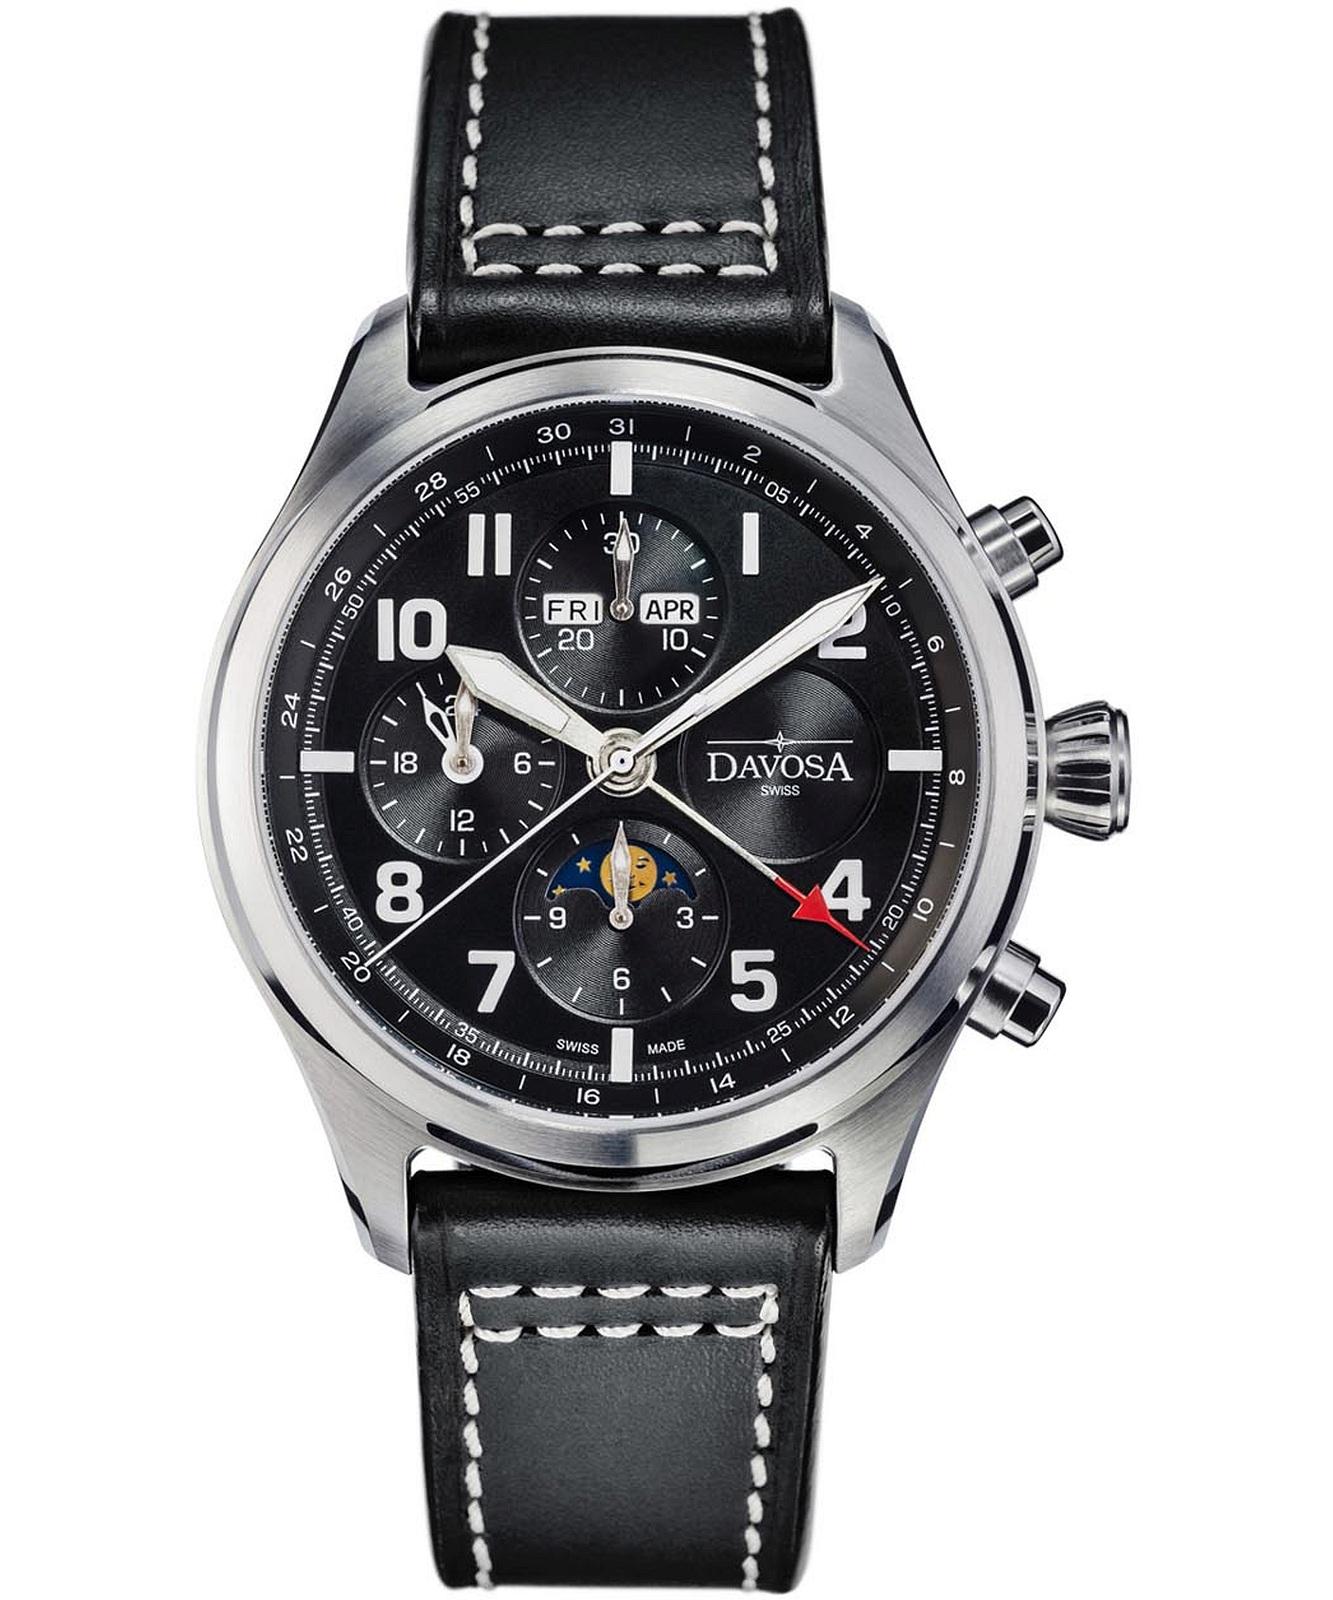 zegarek-meski-davosa-newton-pilot-moonphase-automatic-valjoux-chronograph-limited-161-586-55_001